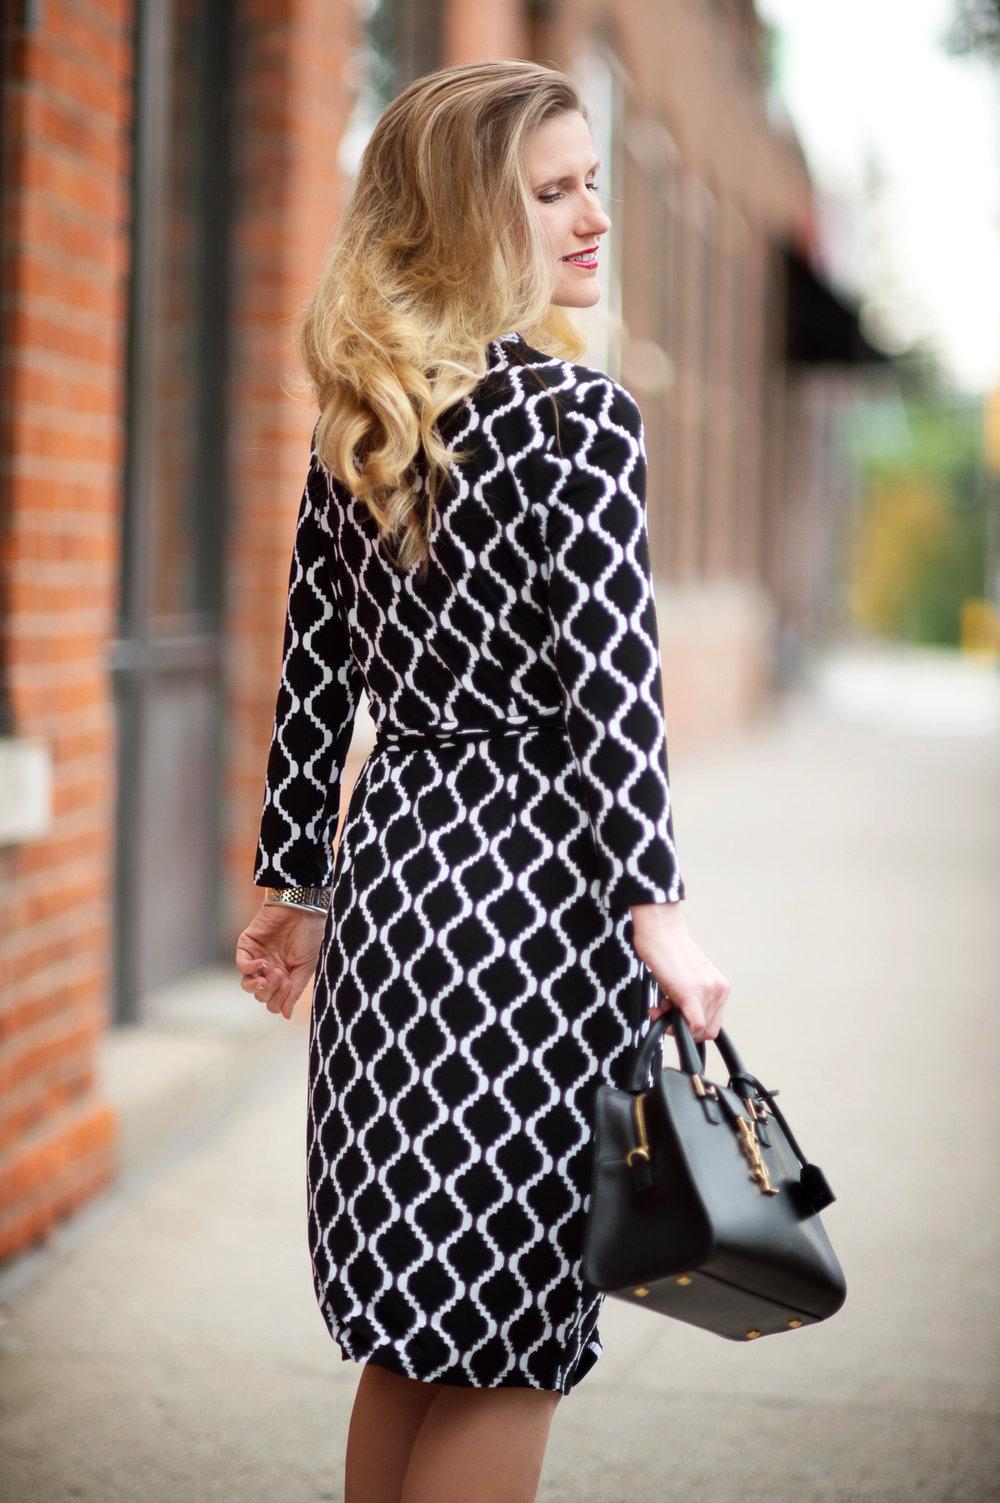 Petite-Fashion-and-Style-Blog---Maggy-London-Philomena-Dress-6.jpg